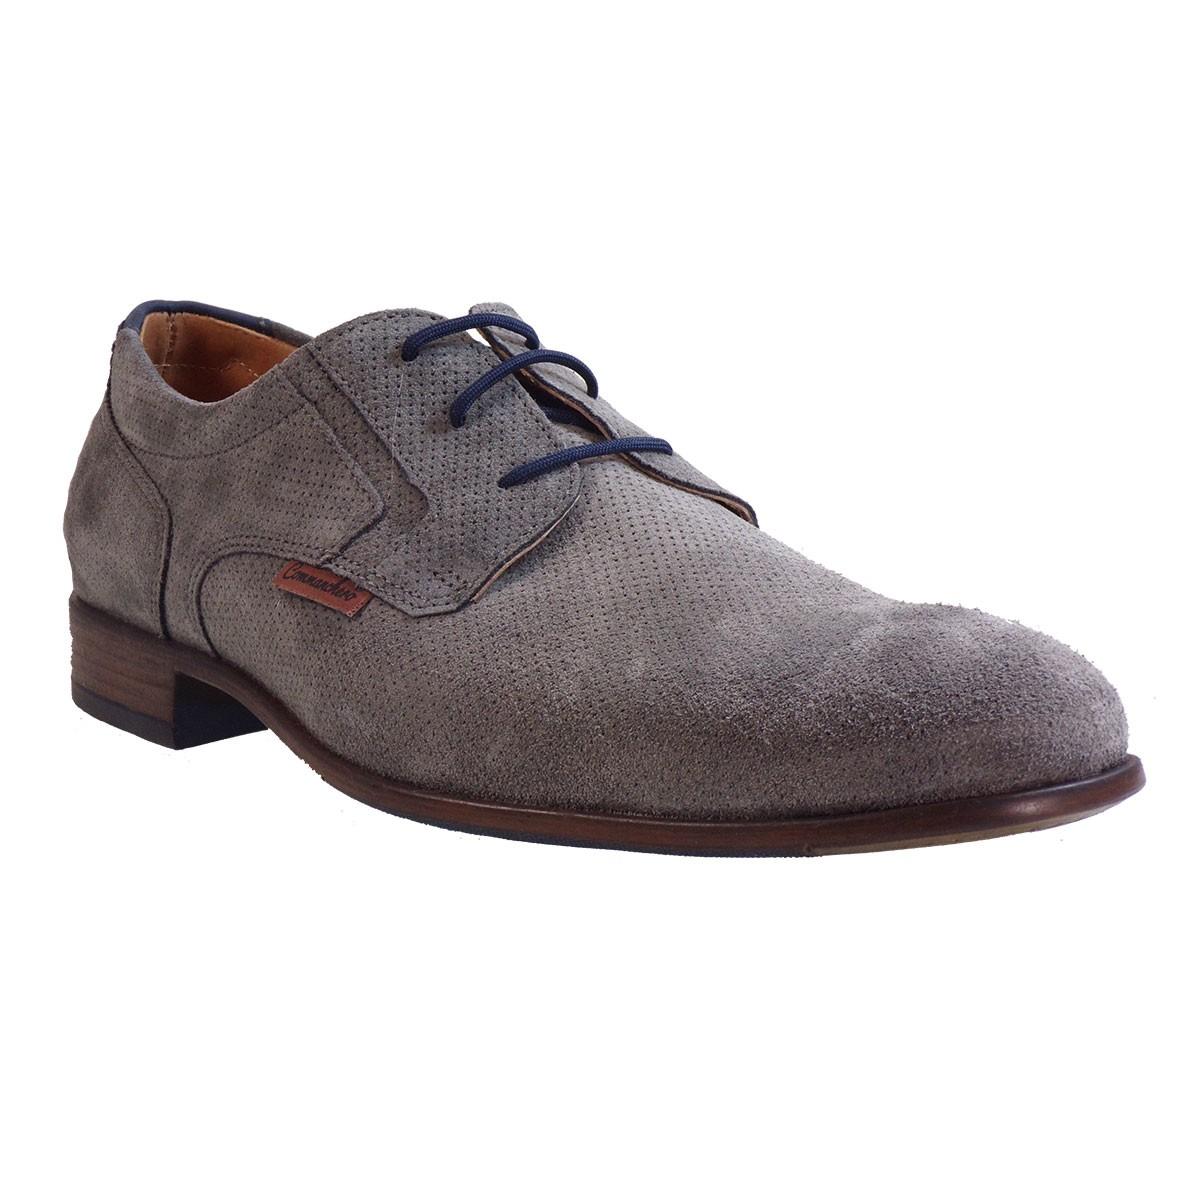 Commanchero Ανδρικά Παπούτσια 91689 Γκρί Δέρμα Καστόρι